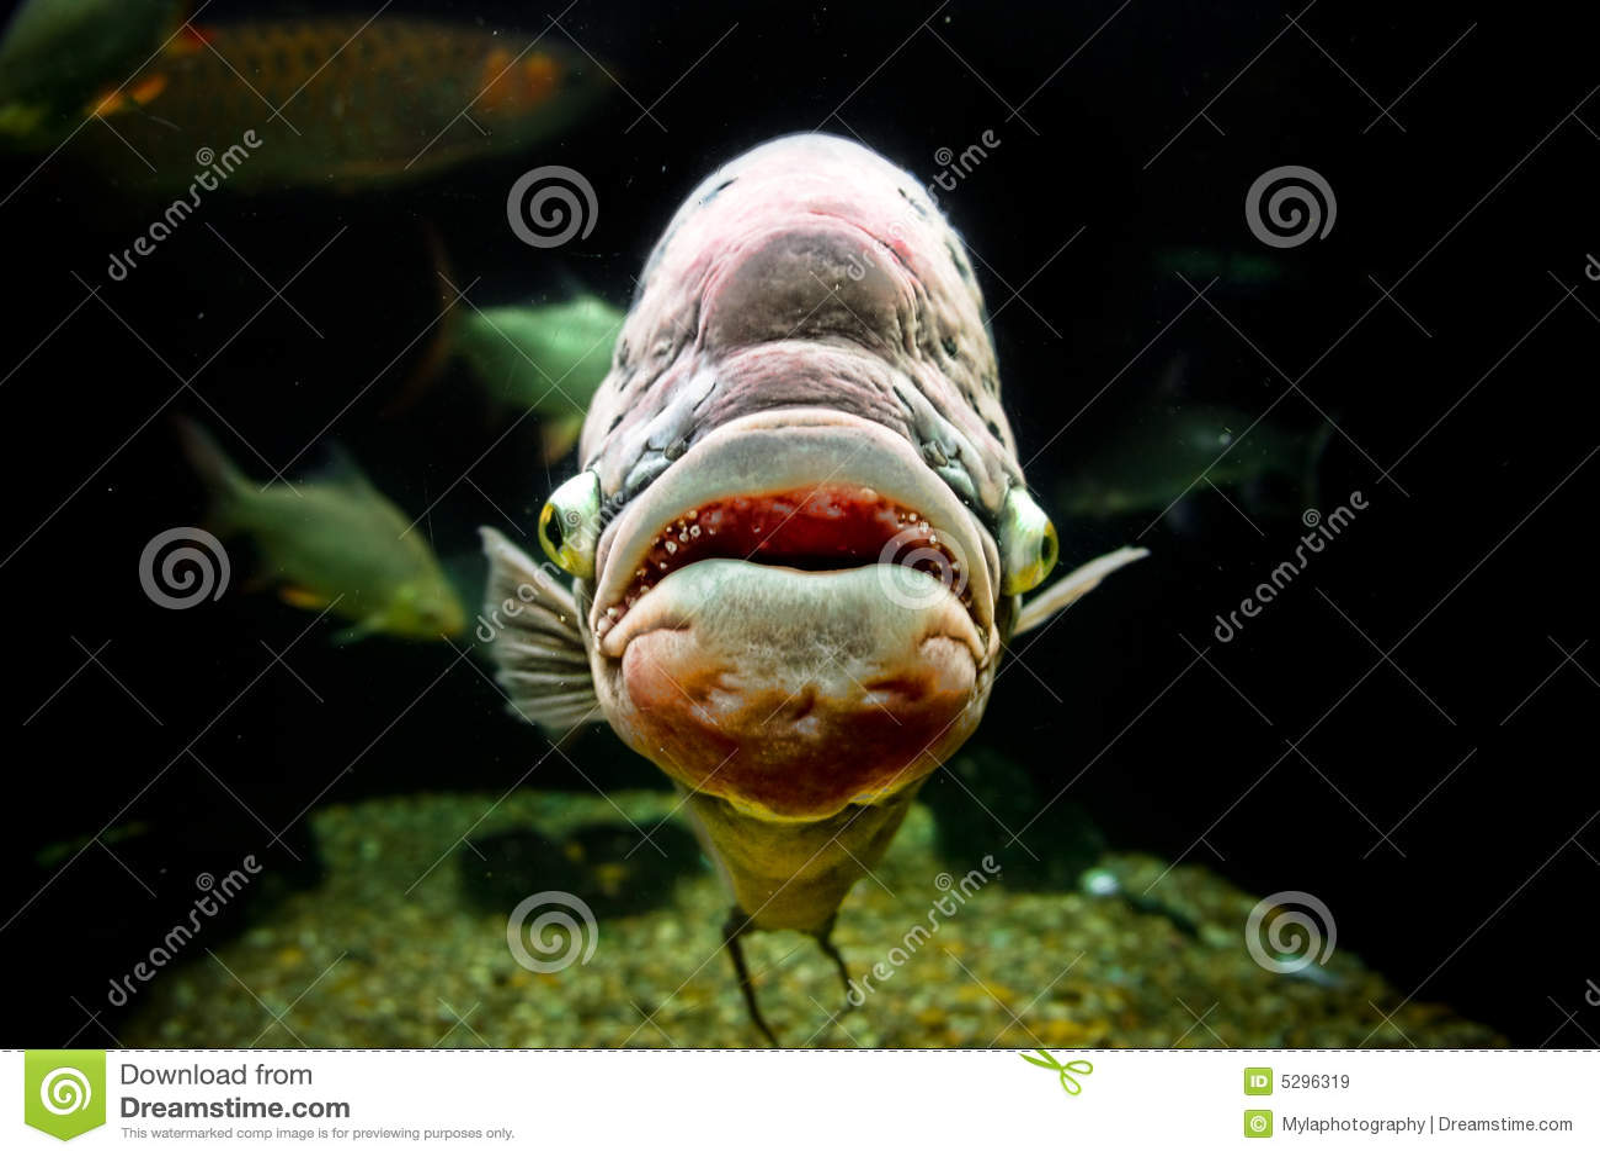 Ugly freshwater aquarium fish - Ugly Fish Royalty Free Stock Images